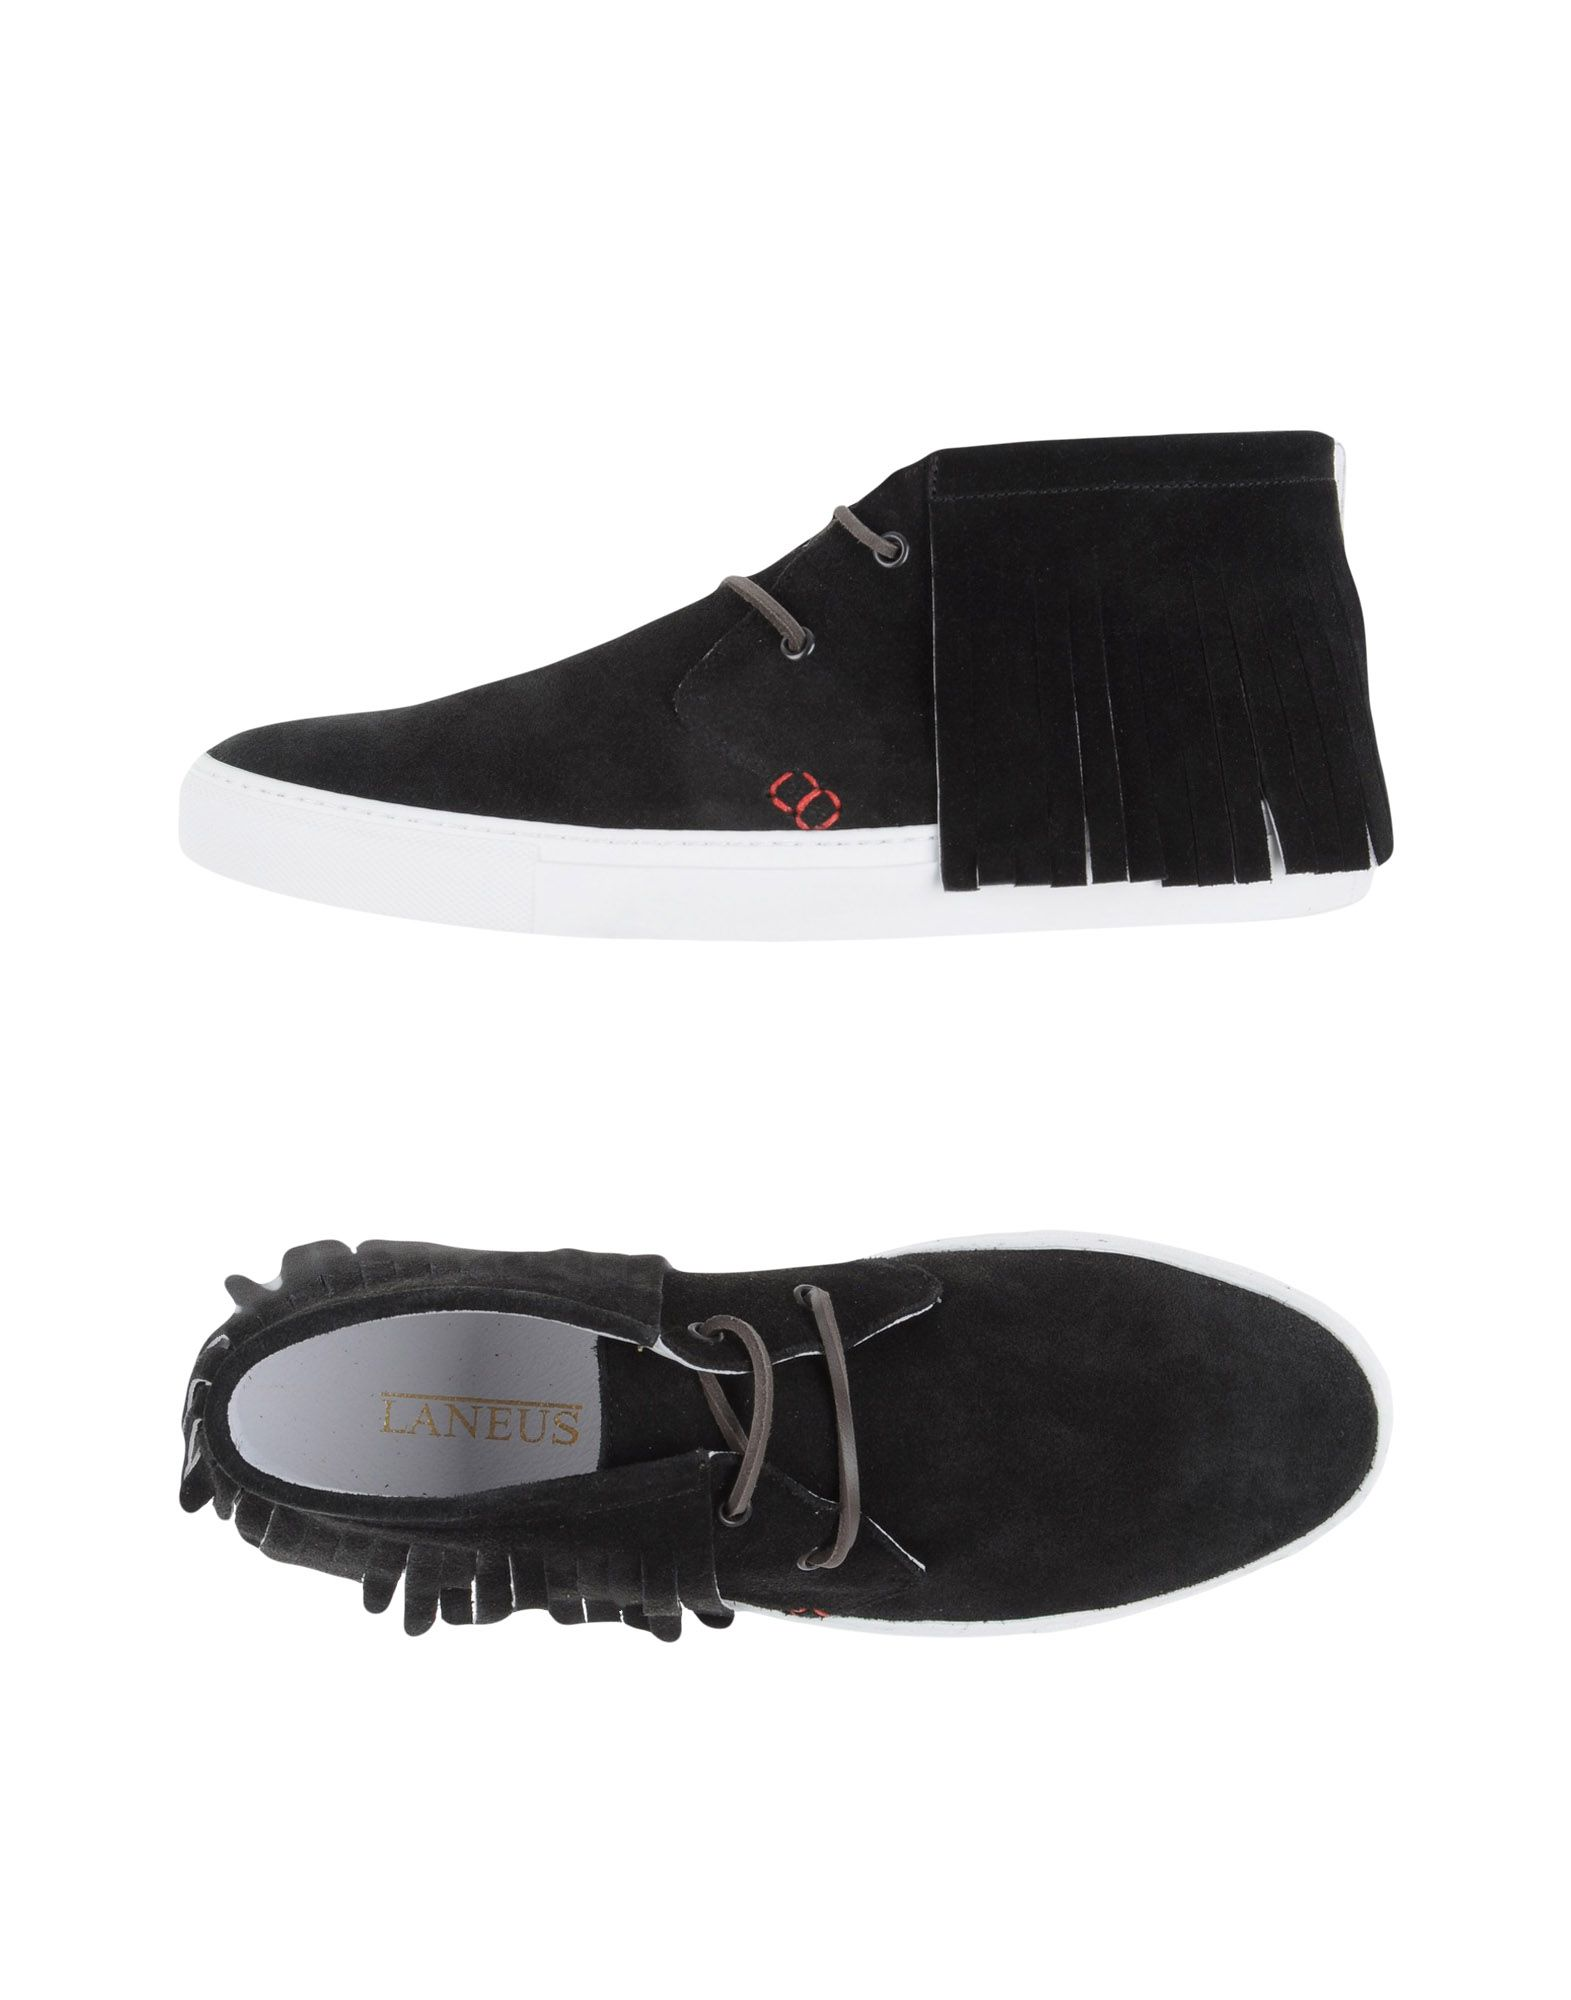 Sneakers Laneus Homme - Sneakers Laneus sur